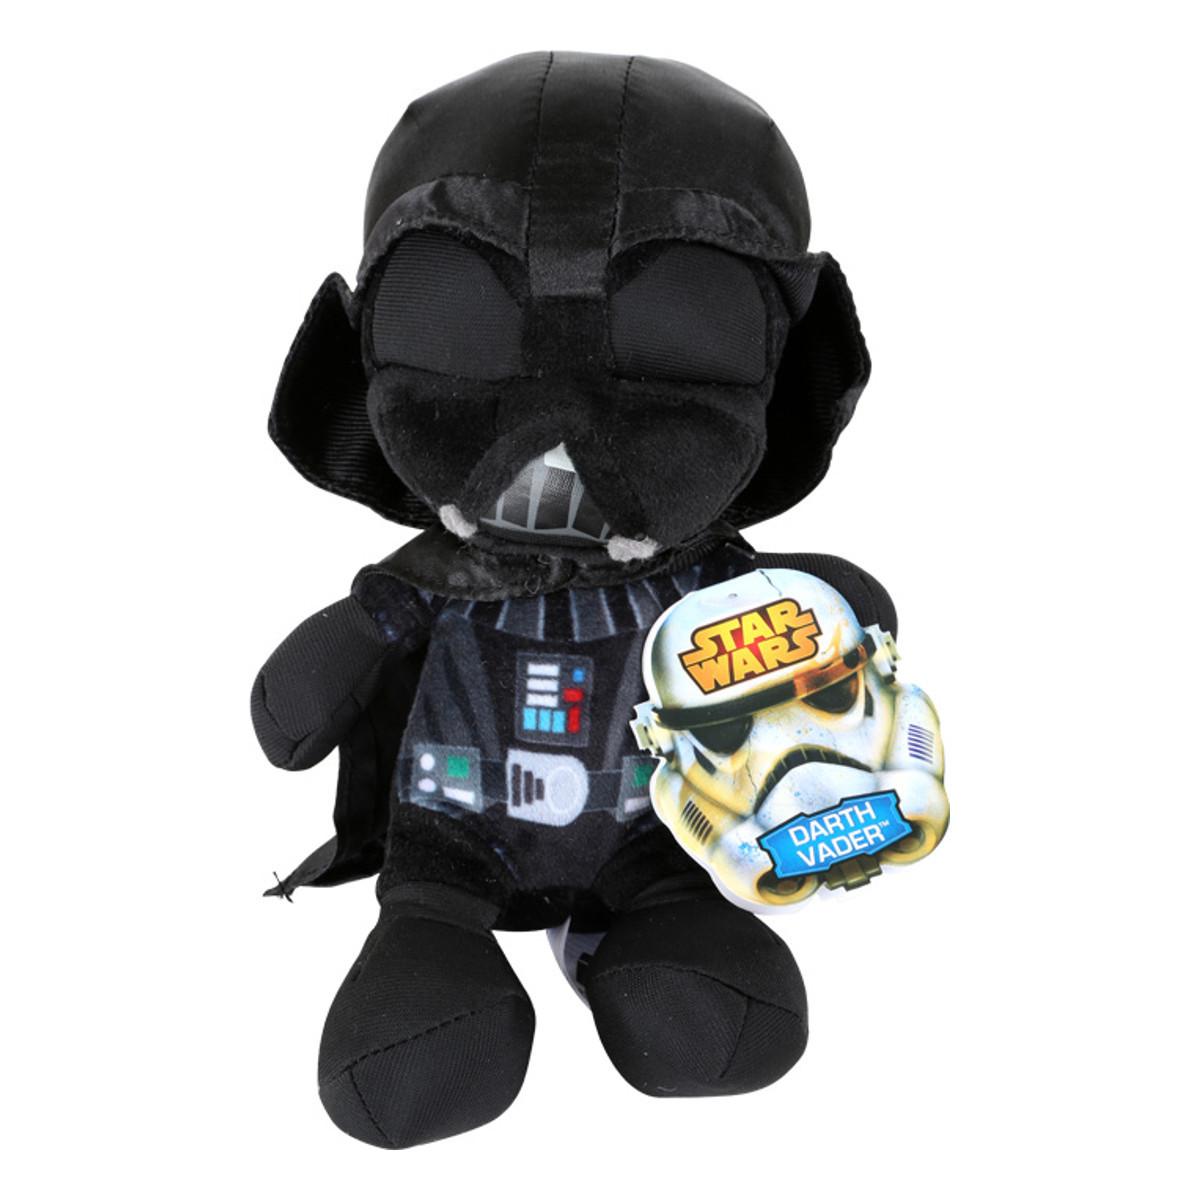 Star-Wars Peluche de Darth Vader